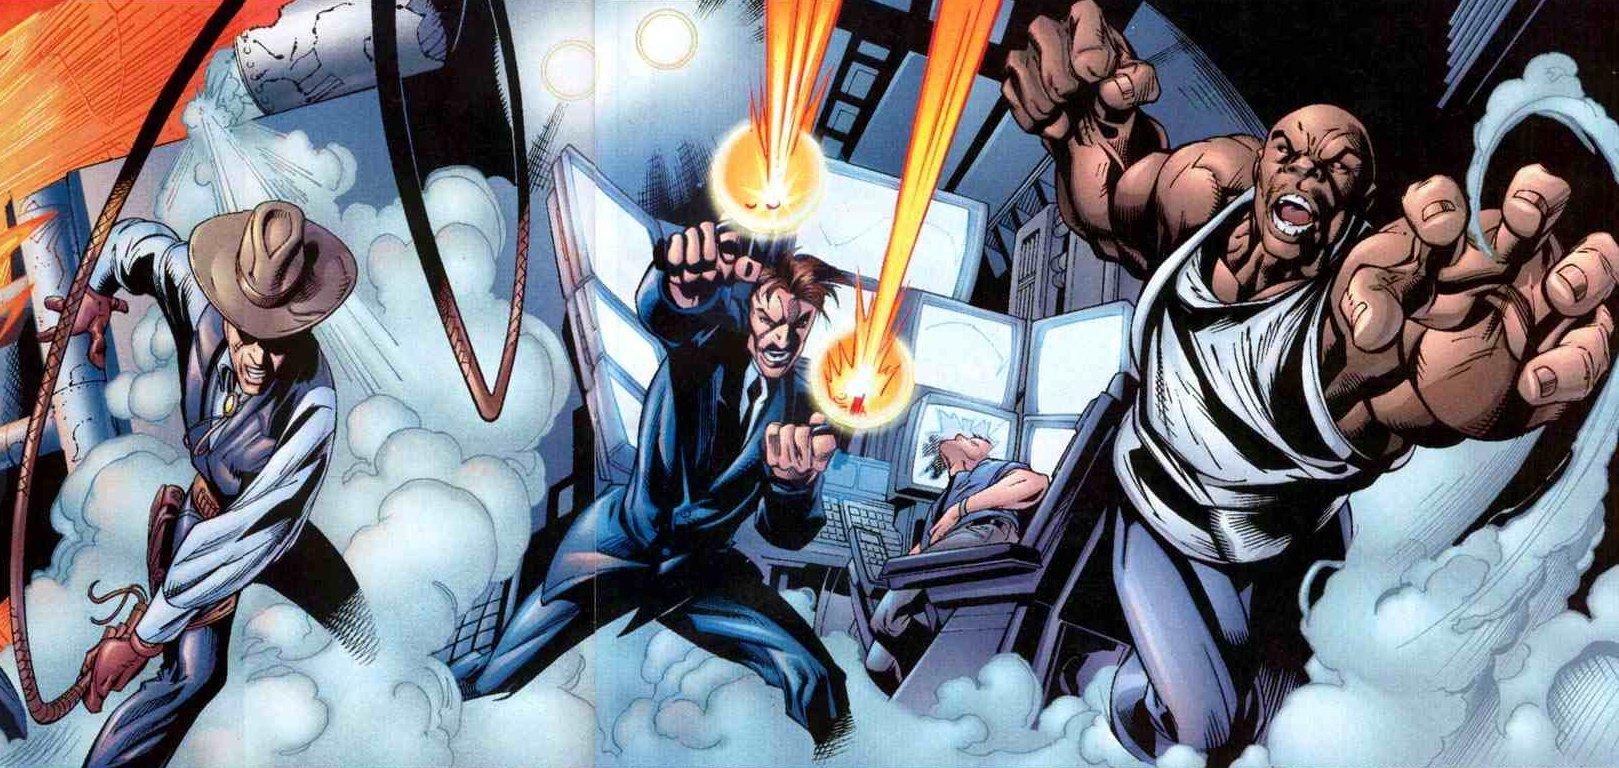 Bronx utcái - Page 2 Ultimate_Spider-Man_Vol_1_12_page_02-03_Enforcers_%28Earth-1610%29